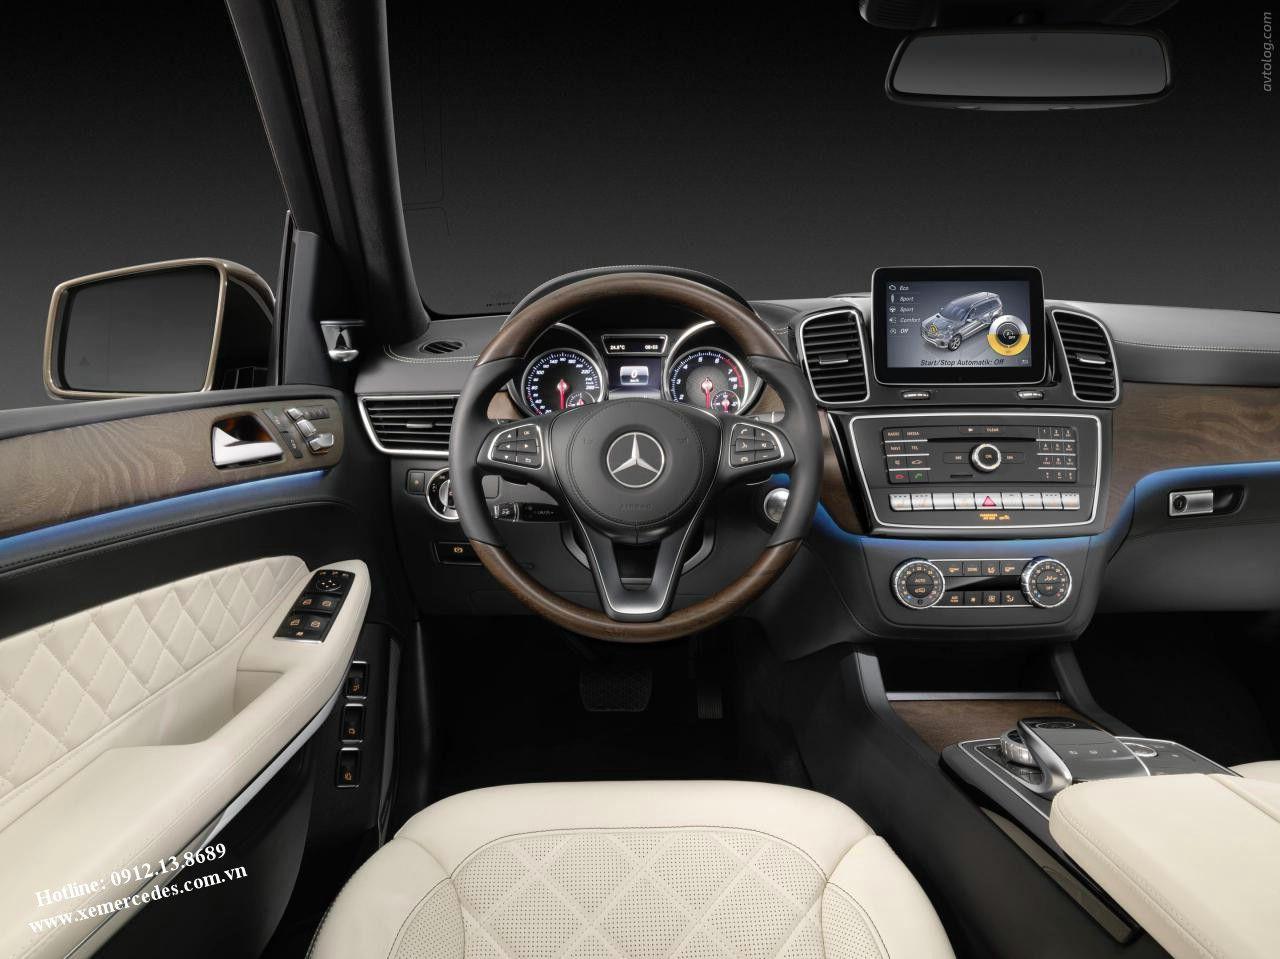 All Types mercedes gls 2017 : Mercedes GLS 500 4Matic 2016   cai   Pinterest   Luxury cars ...